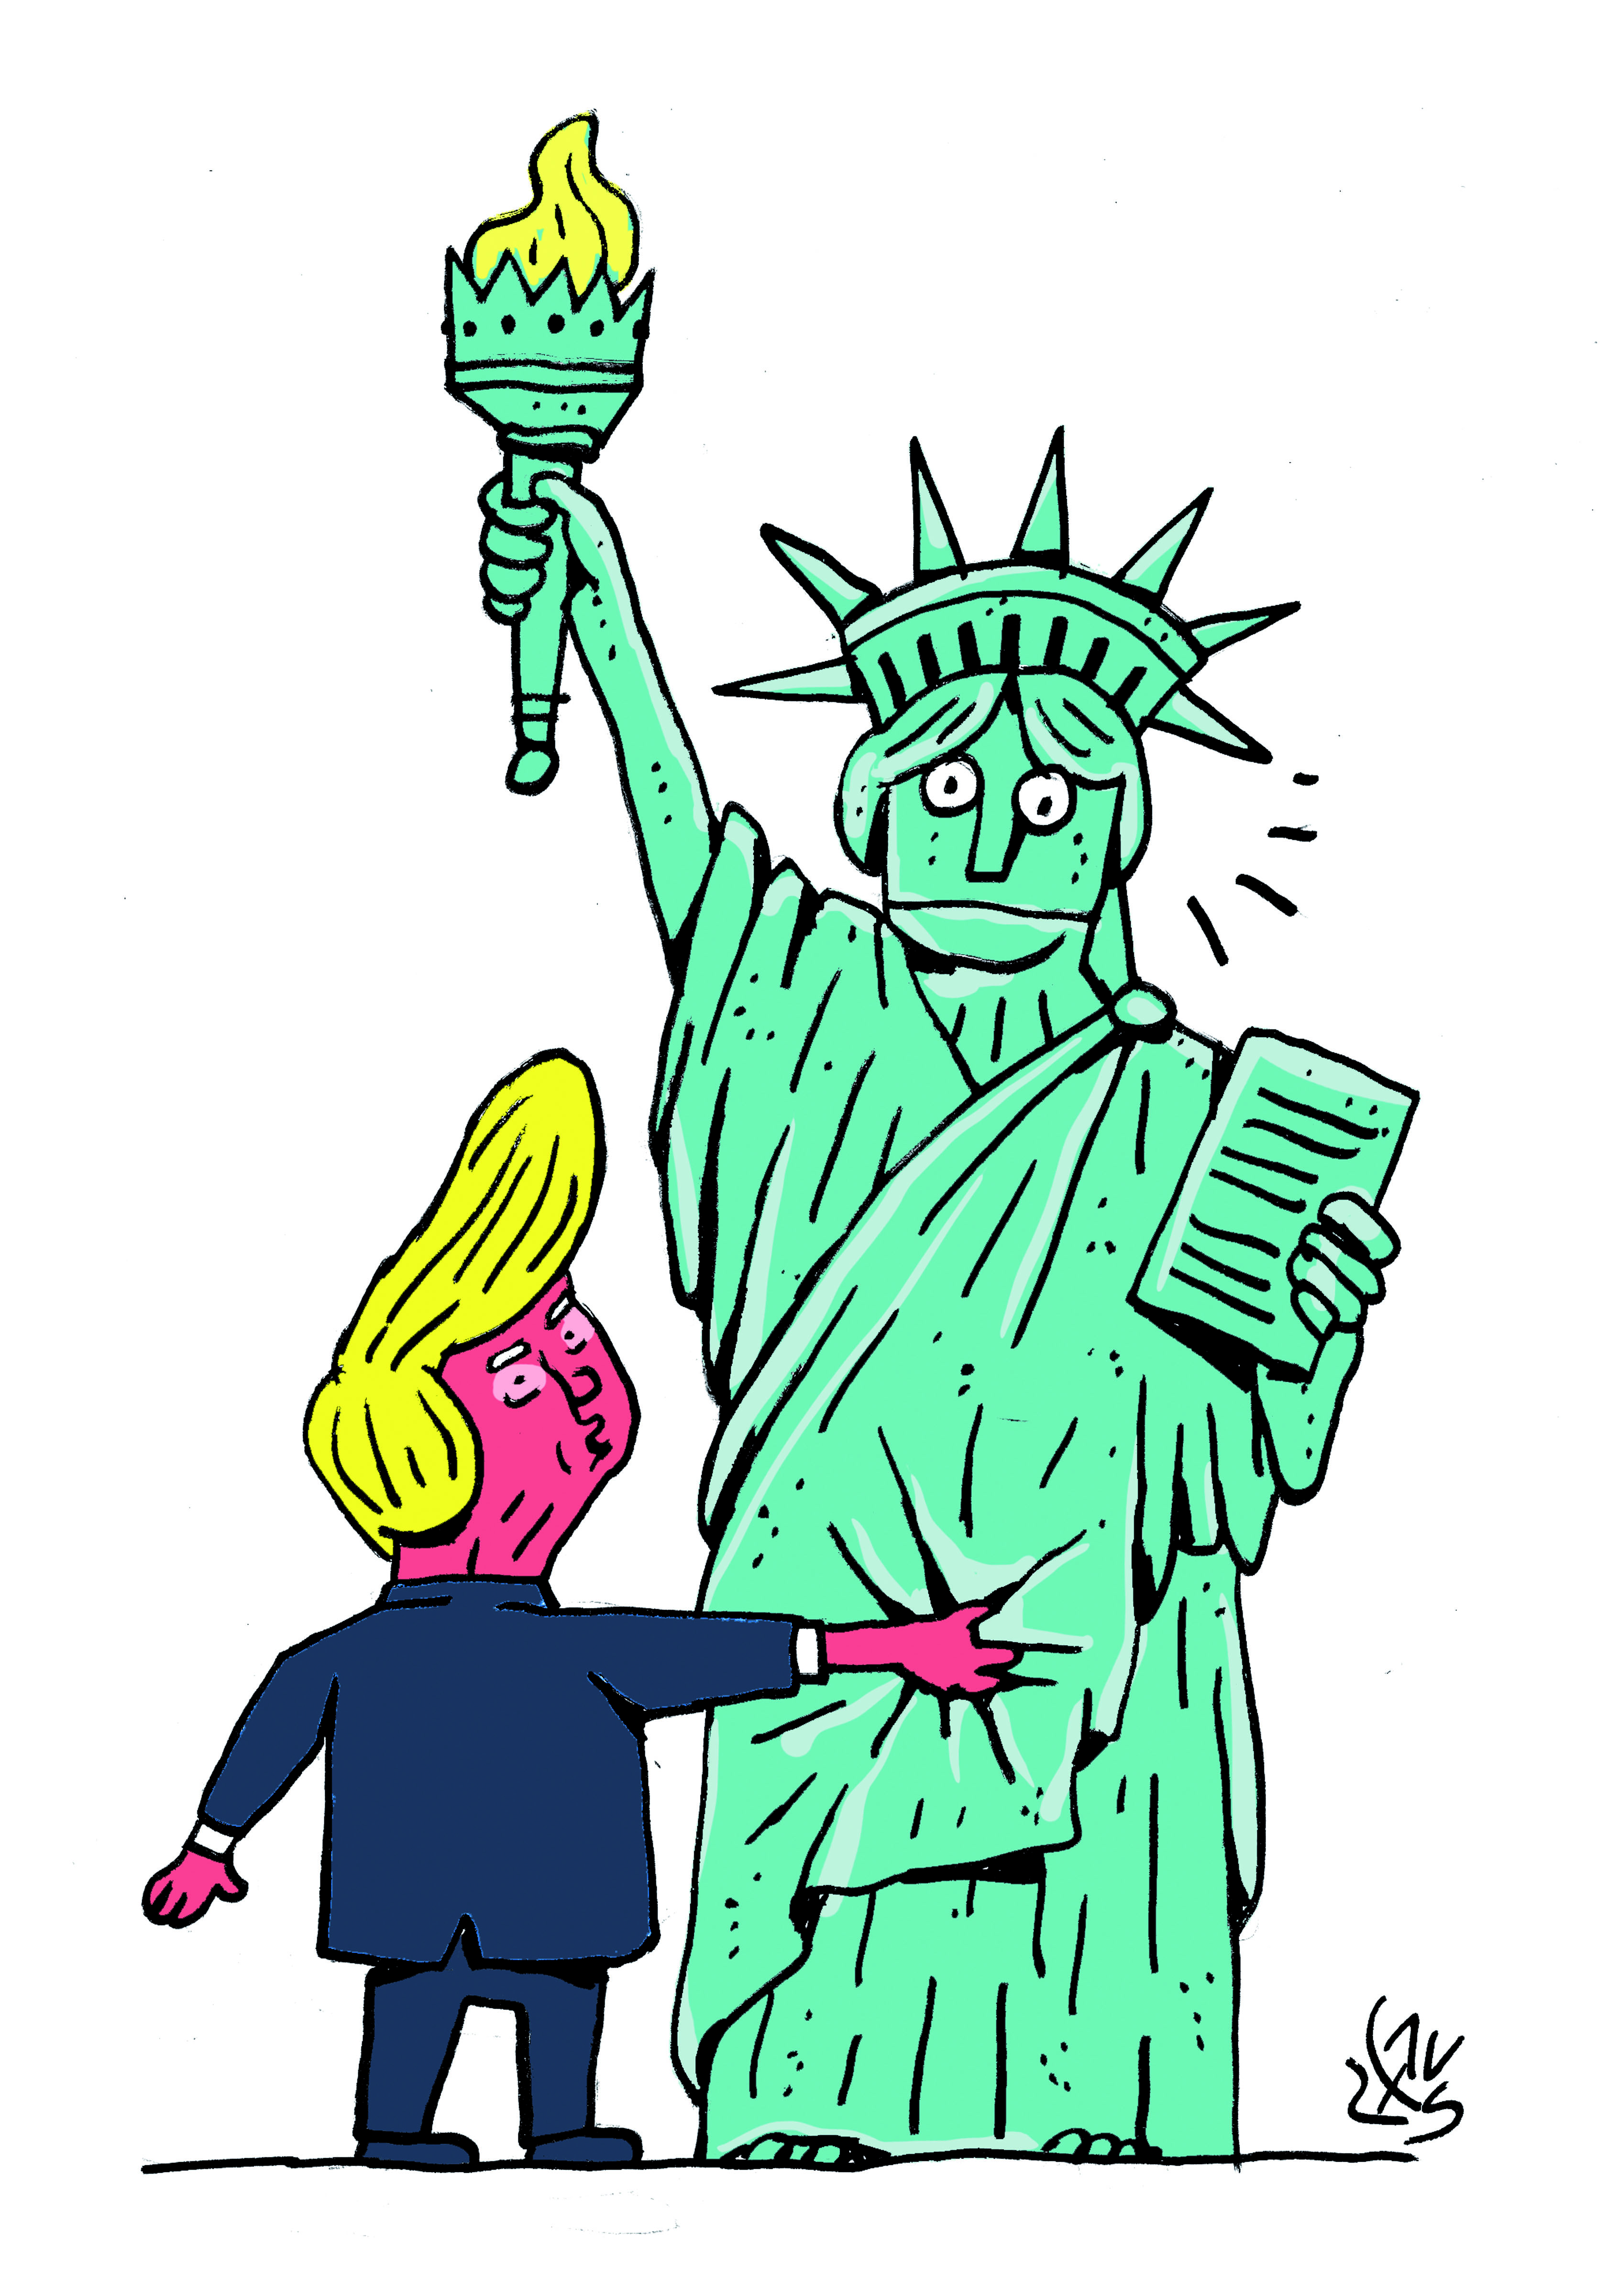 Groping Trump